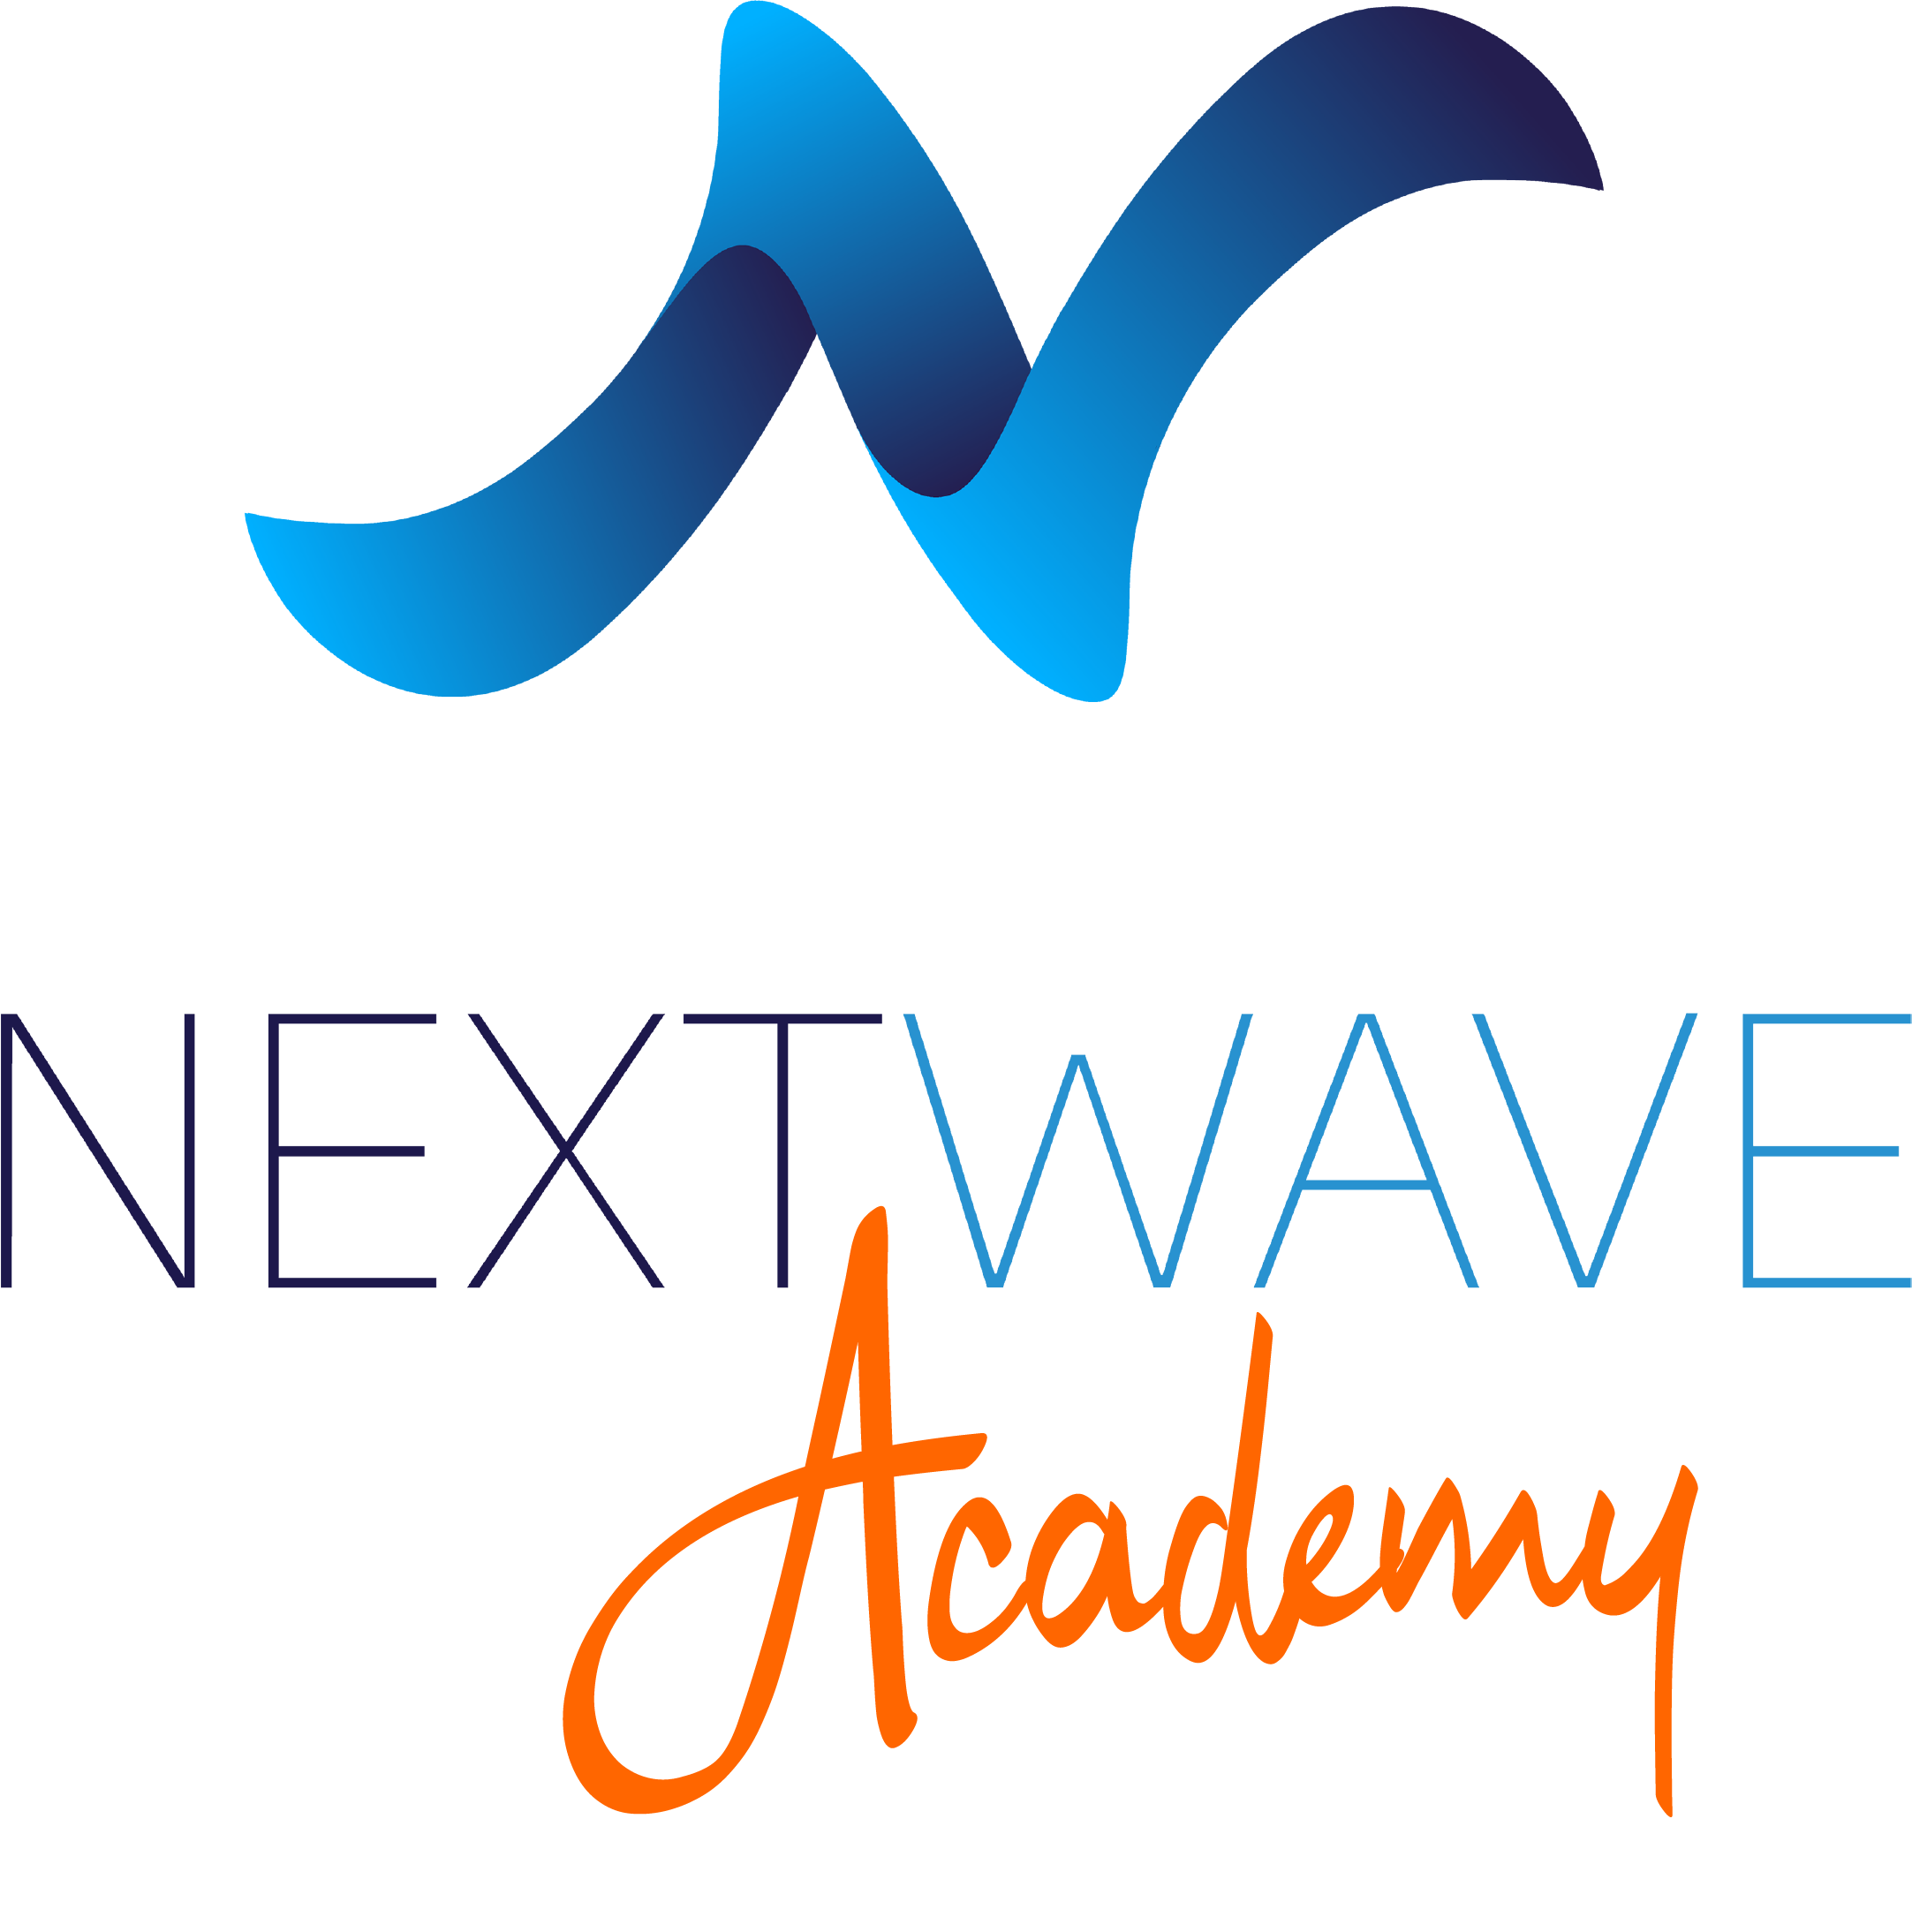 https://nextwavehellas.com/wp-content/uploads/2020/10/Academy.png